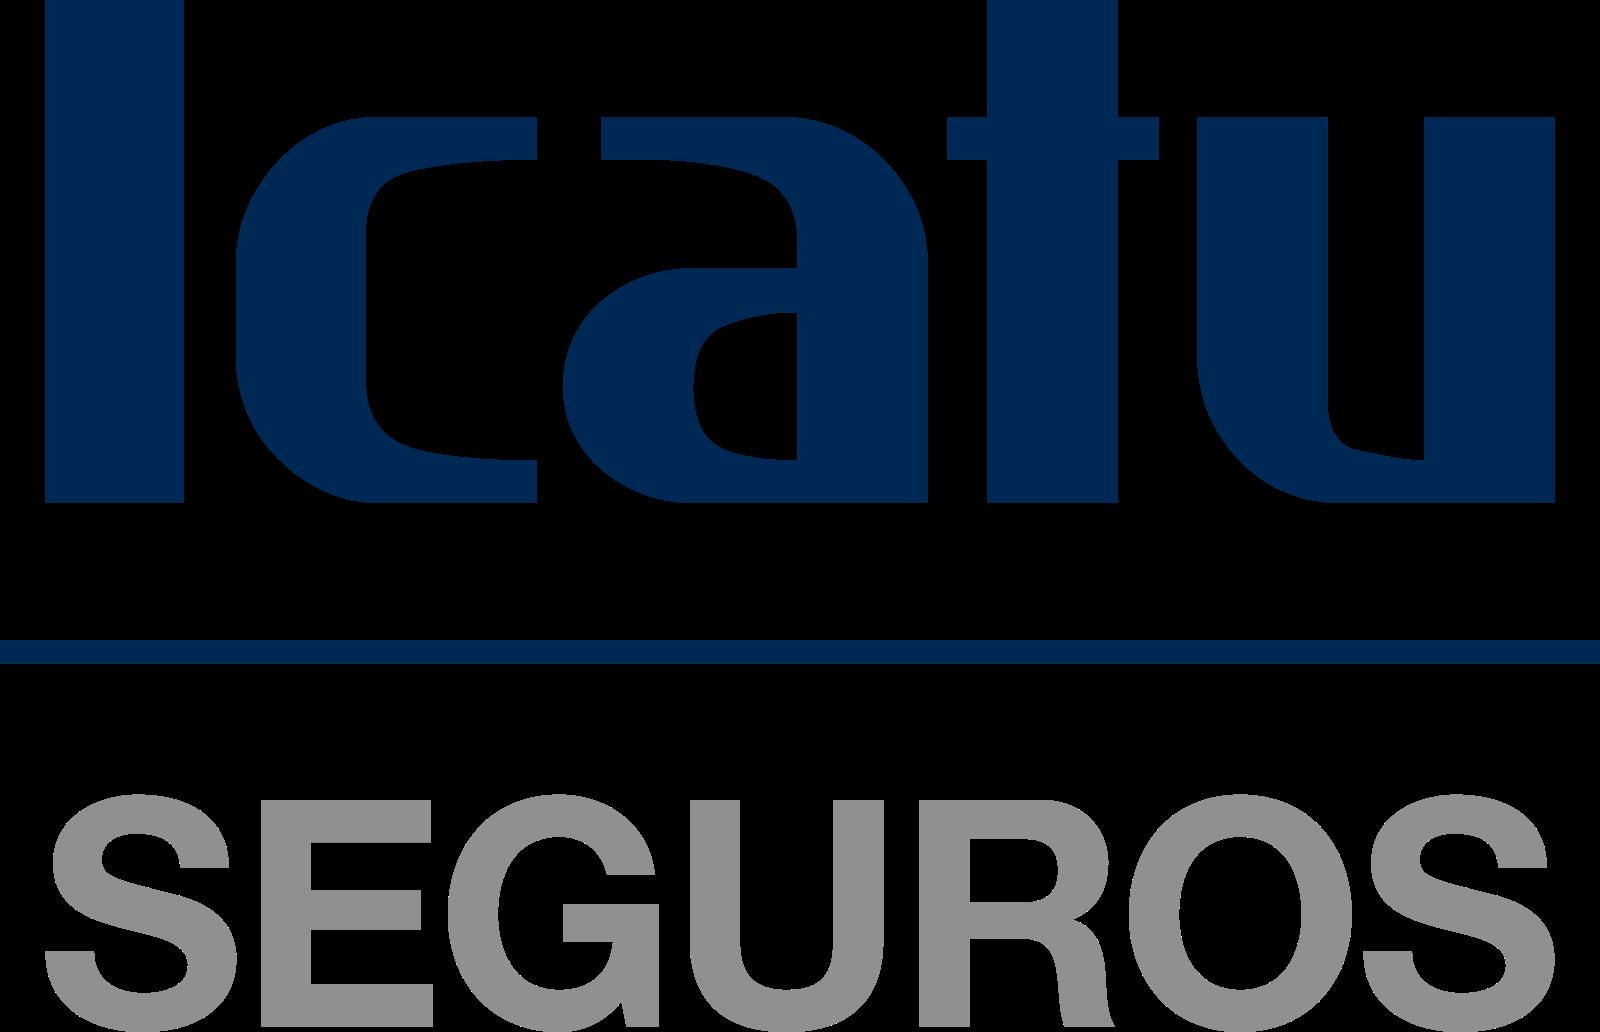 icatu-logo-3